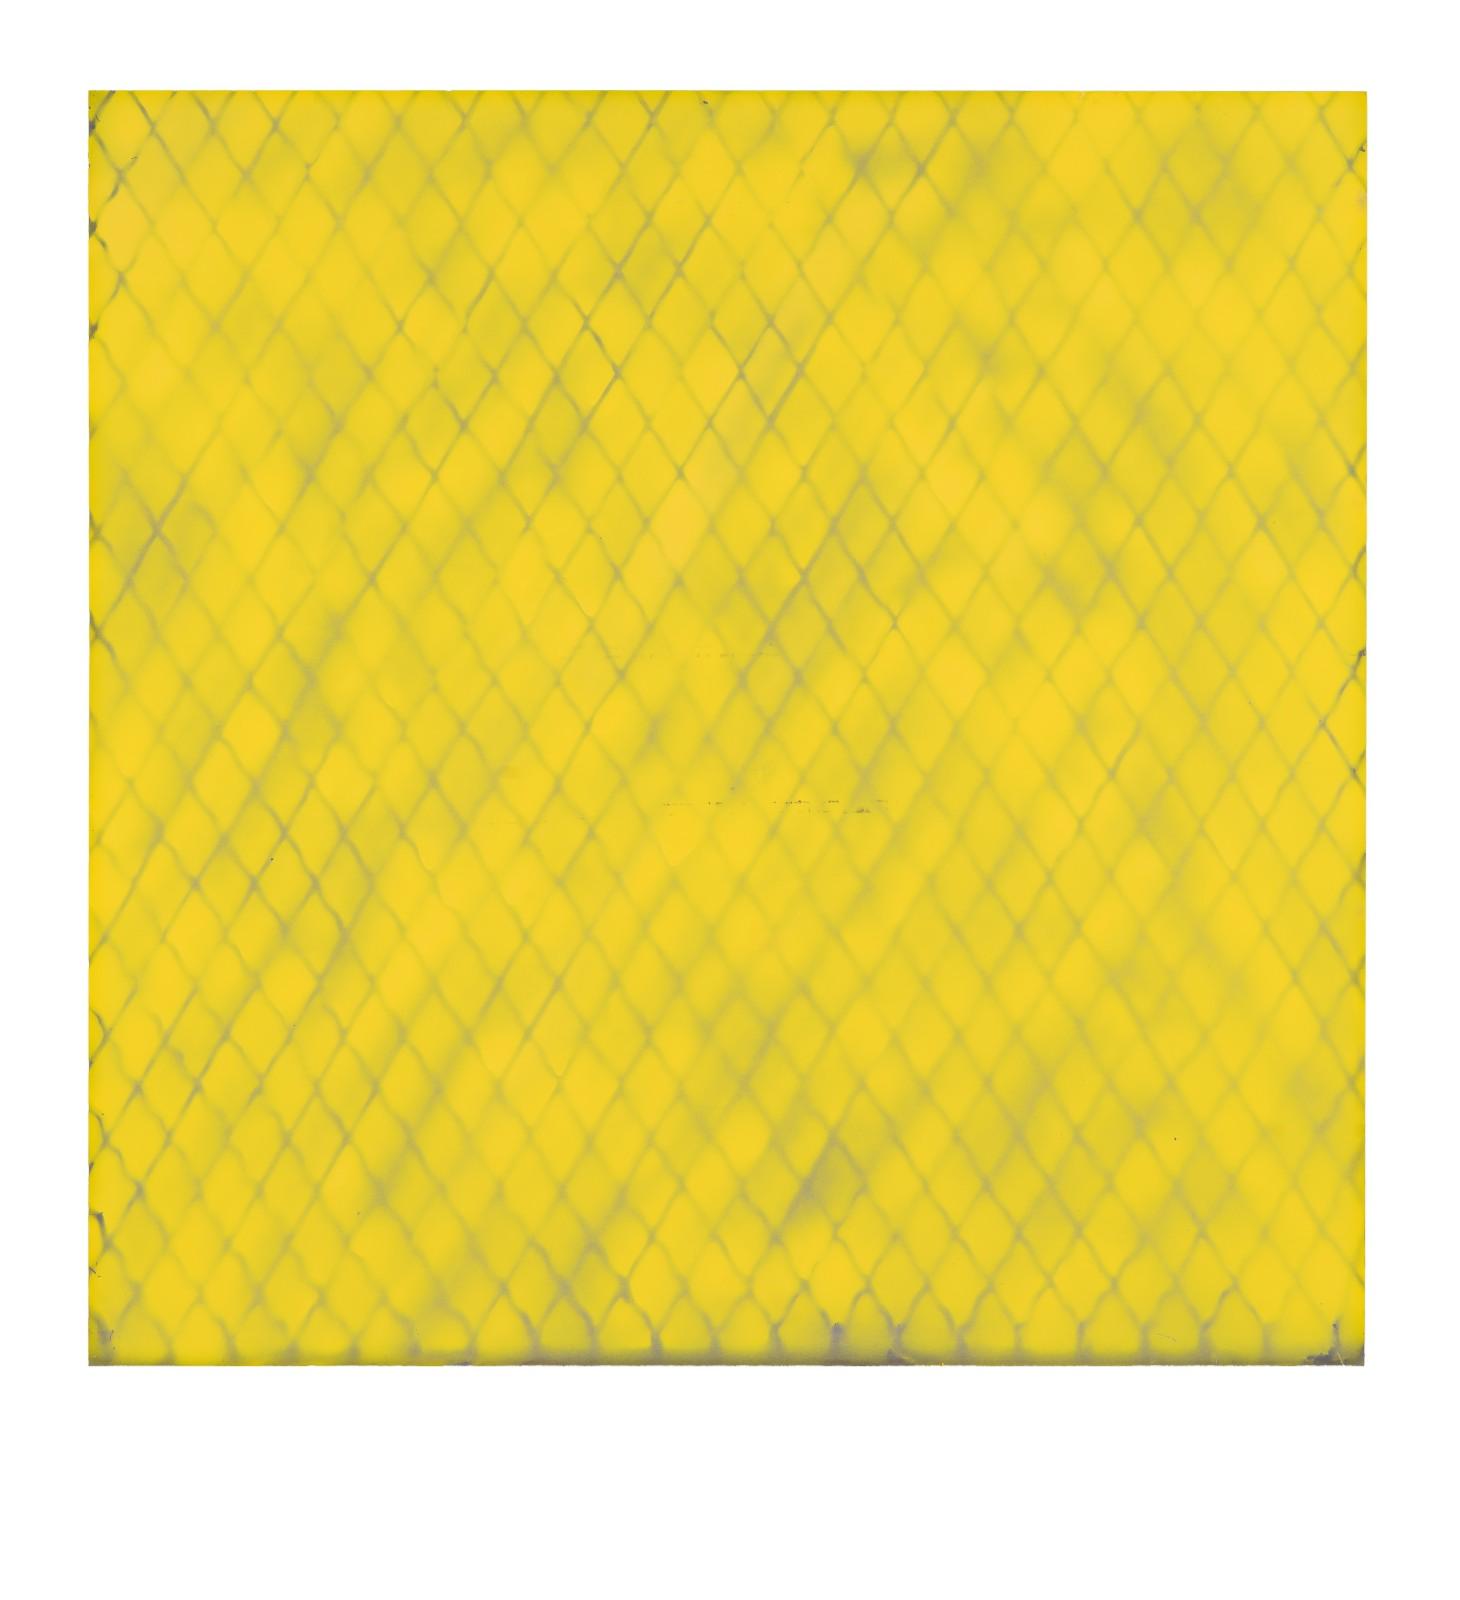 "STAIN : 40°43'08.0""N 73°56'08.6""W, 2015, spraypaint on aluminium, 81,3 x 81,3 cm"